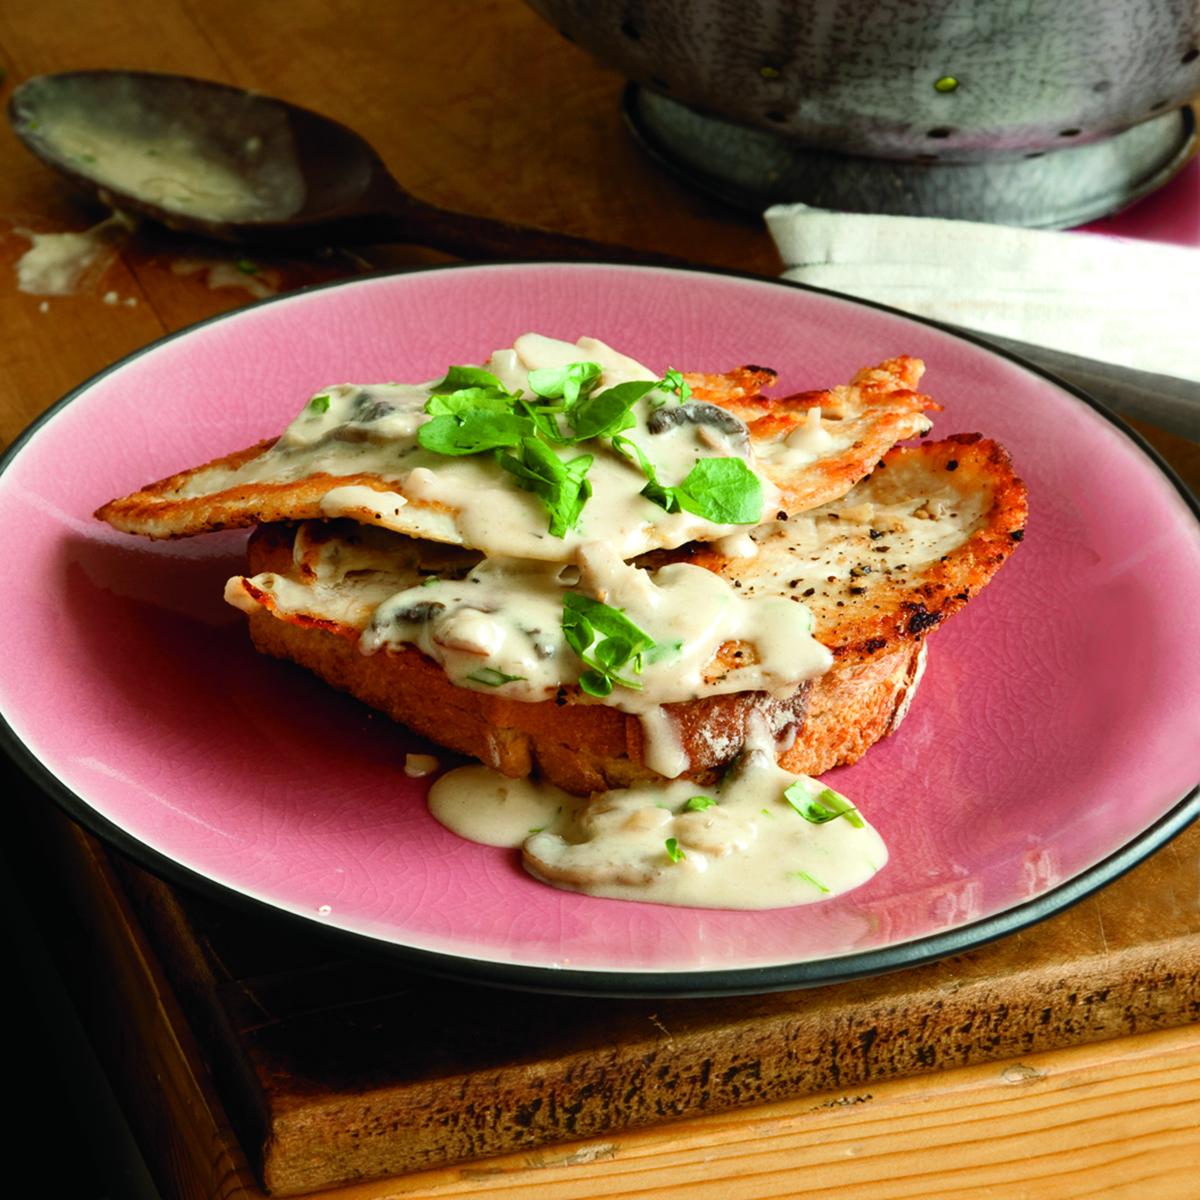 Open-Face Hot Chicken or Turkey Sandwiches with Creamy Mushroom Gravy